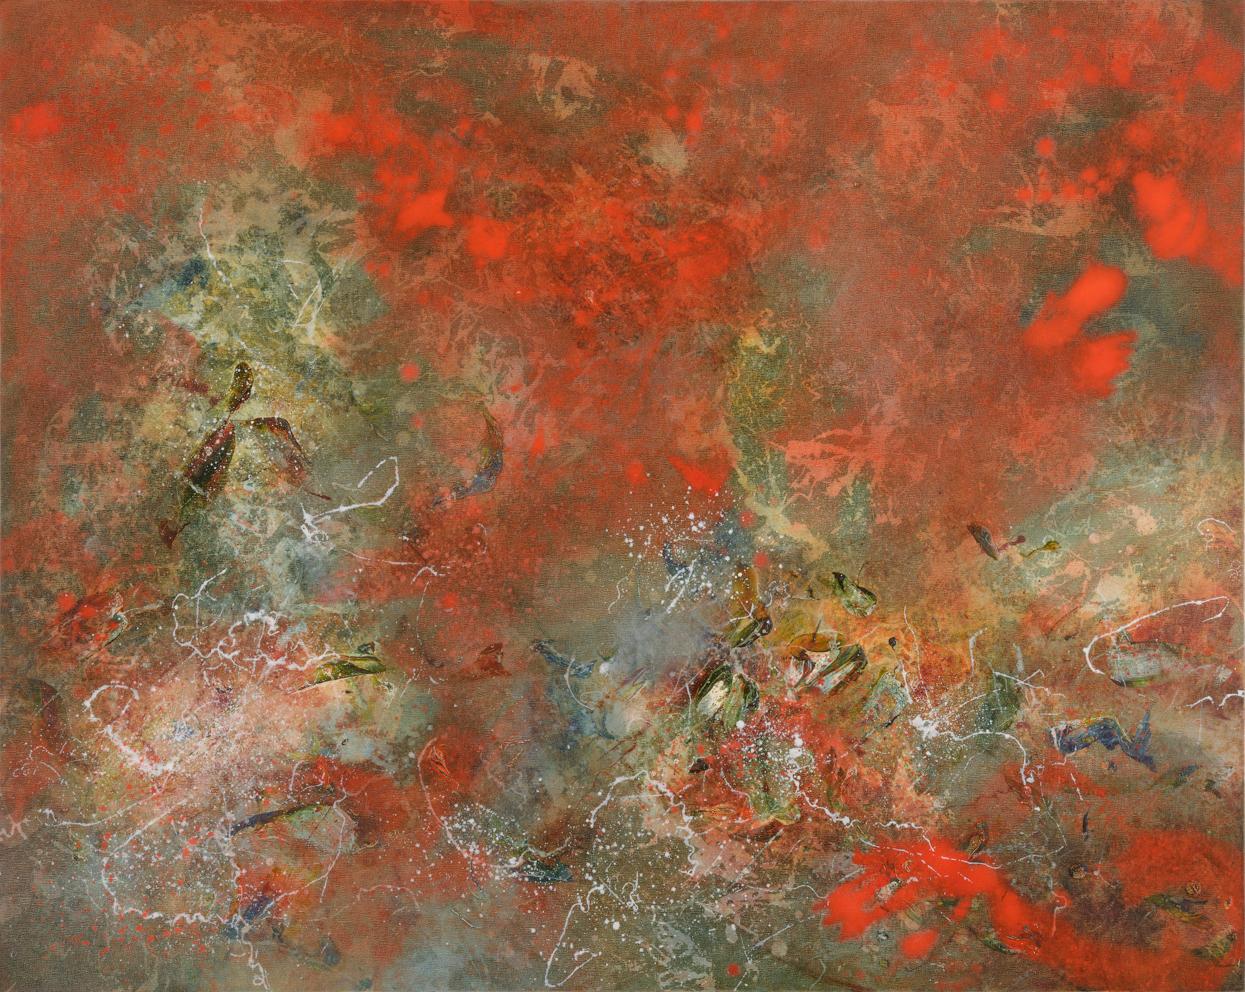 Volatile Rhythm, oil on canvas, 102 x 127 cm, SOLD